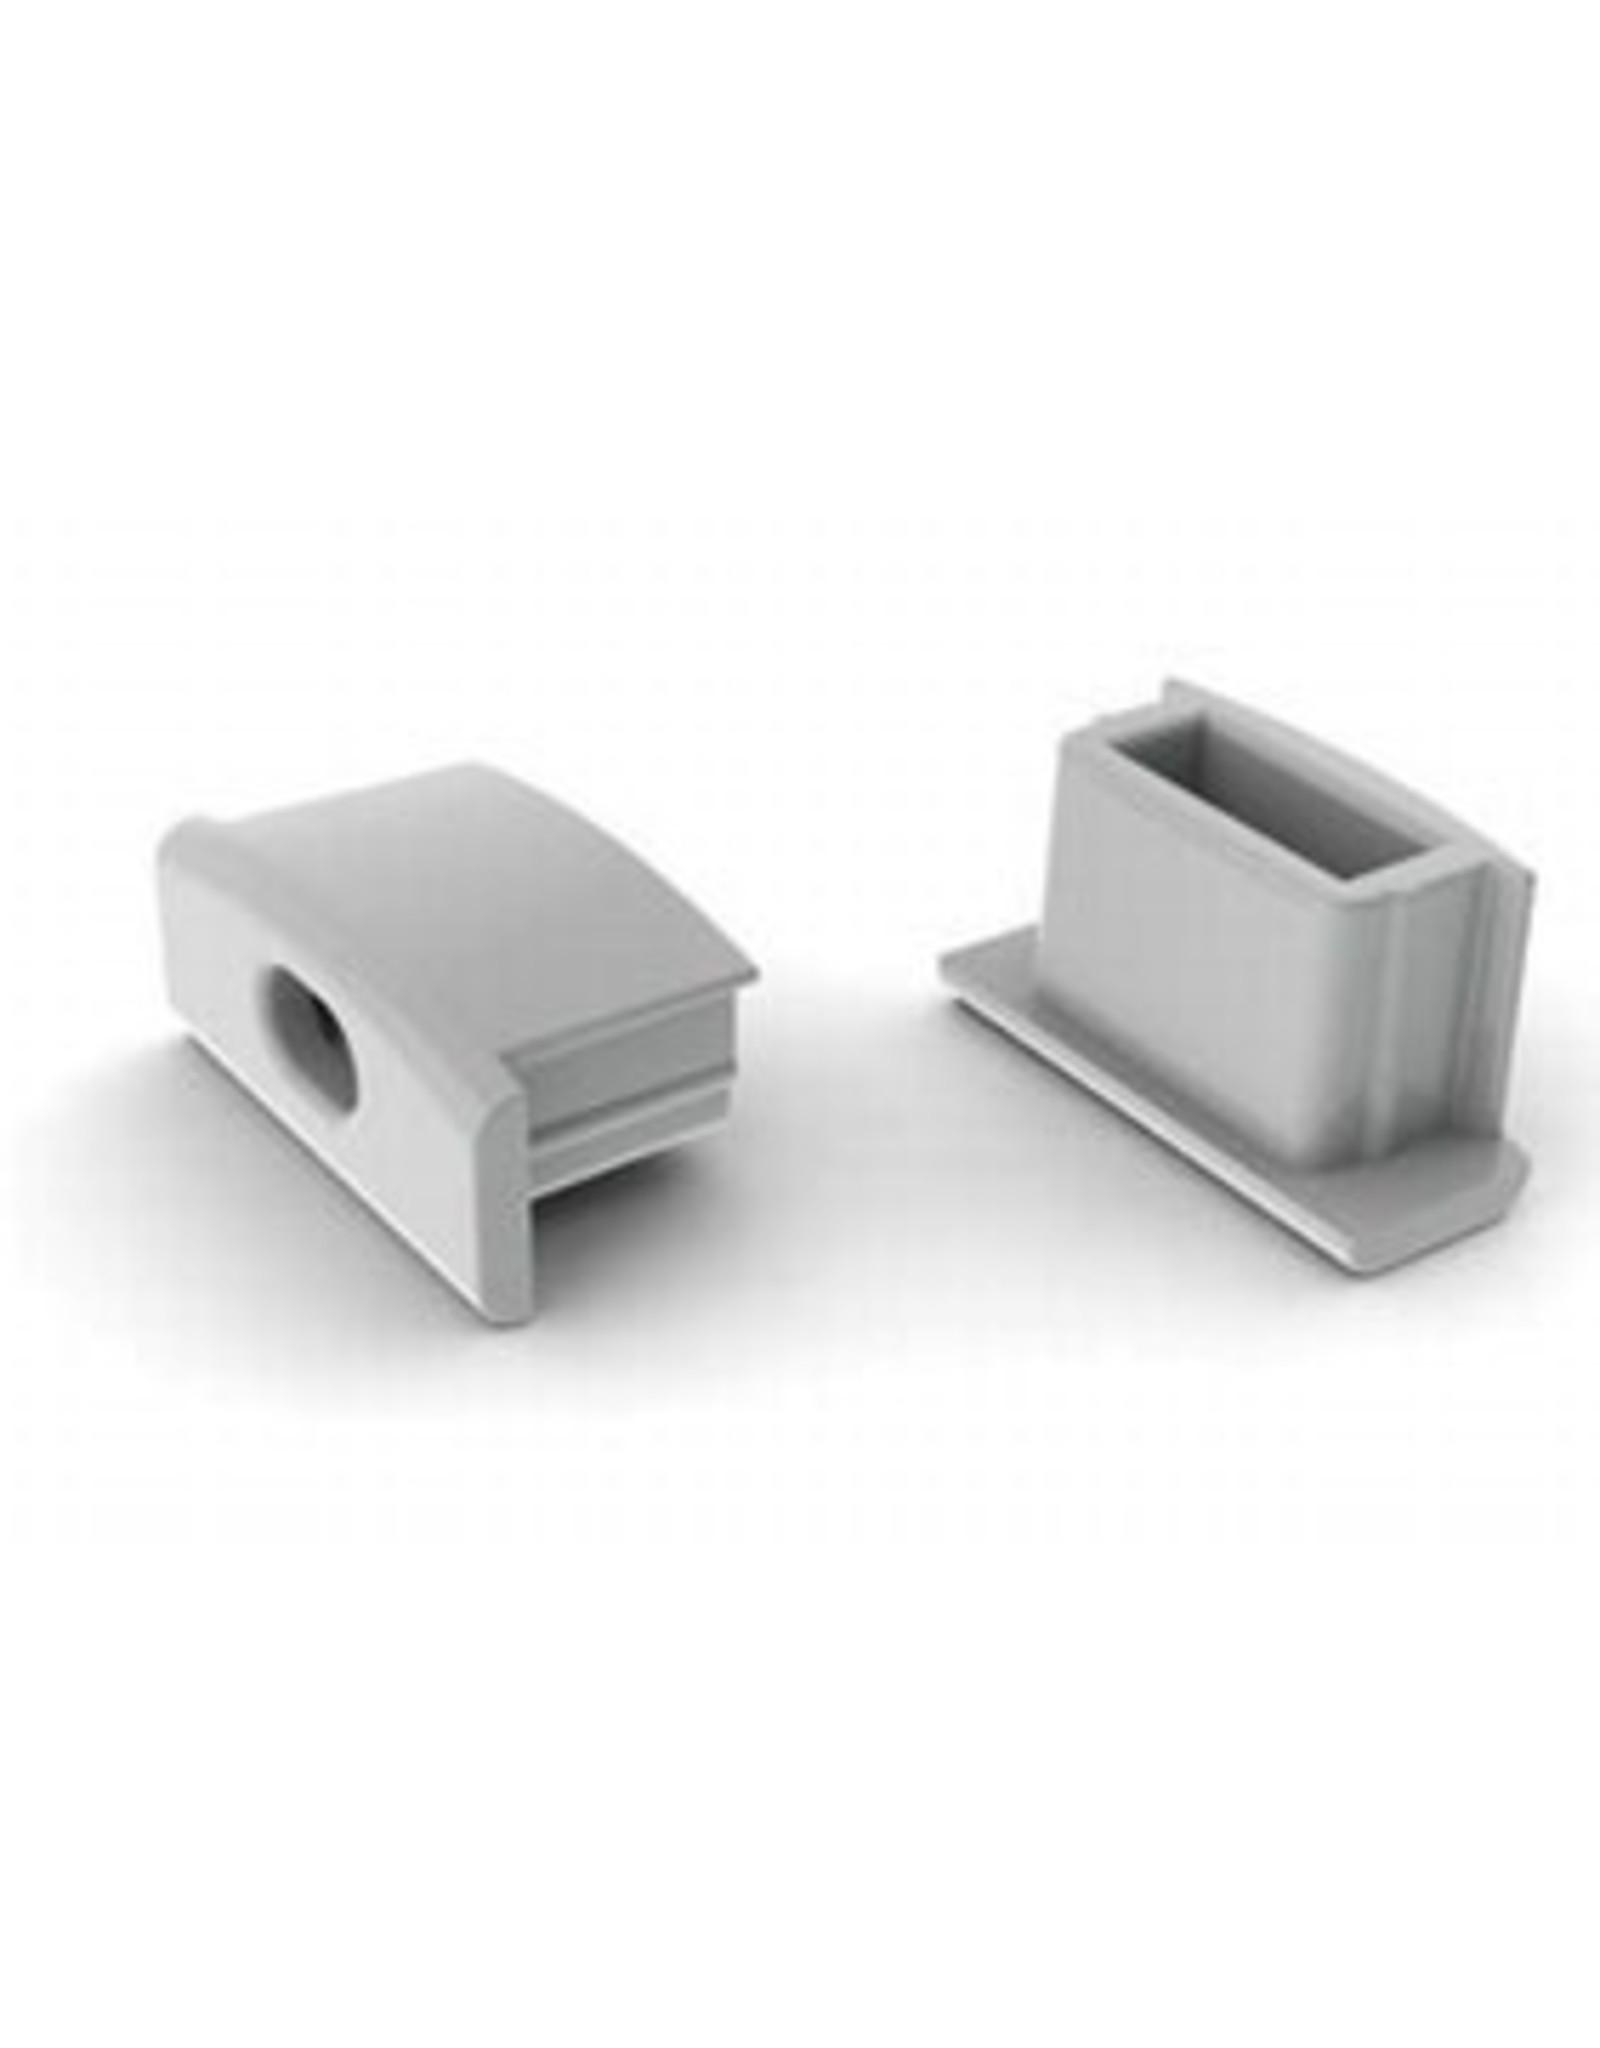 Lights Alu-profile Endcap U - 7mm - per piece